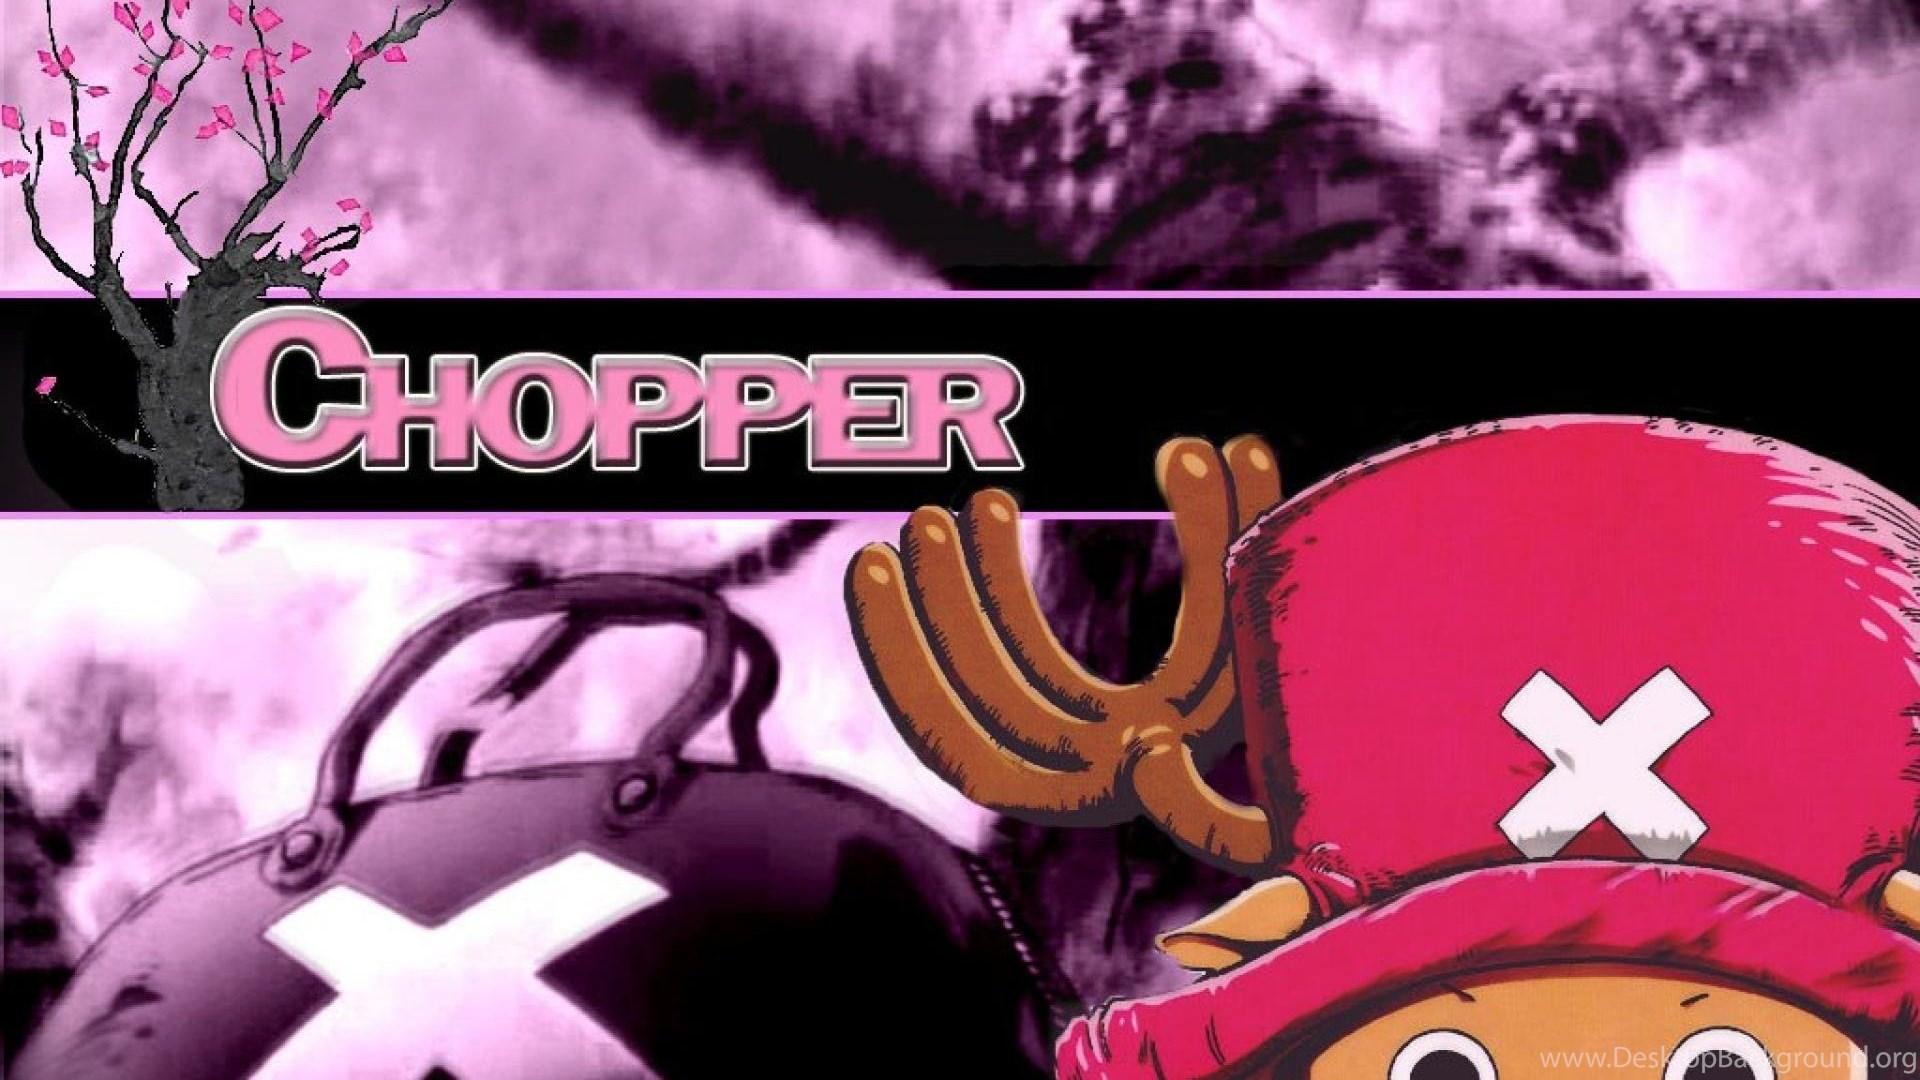 One Piece Doctor Chopper Wallpapers Animebay Wallpapers Desktop Background